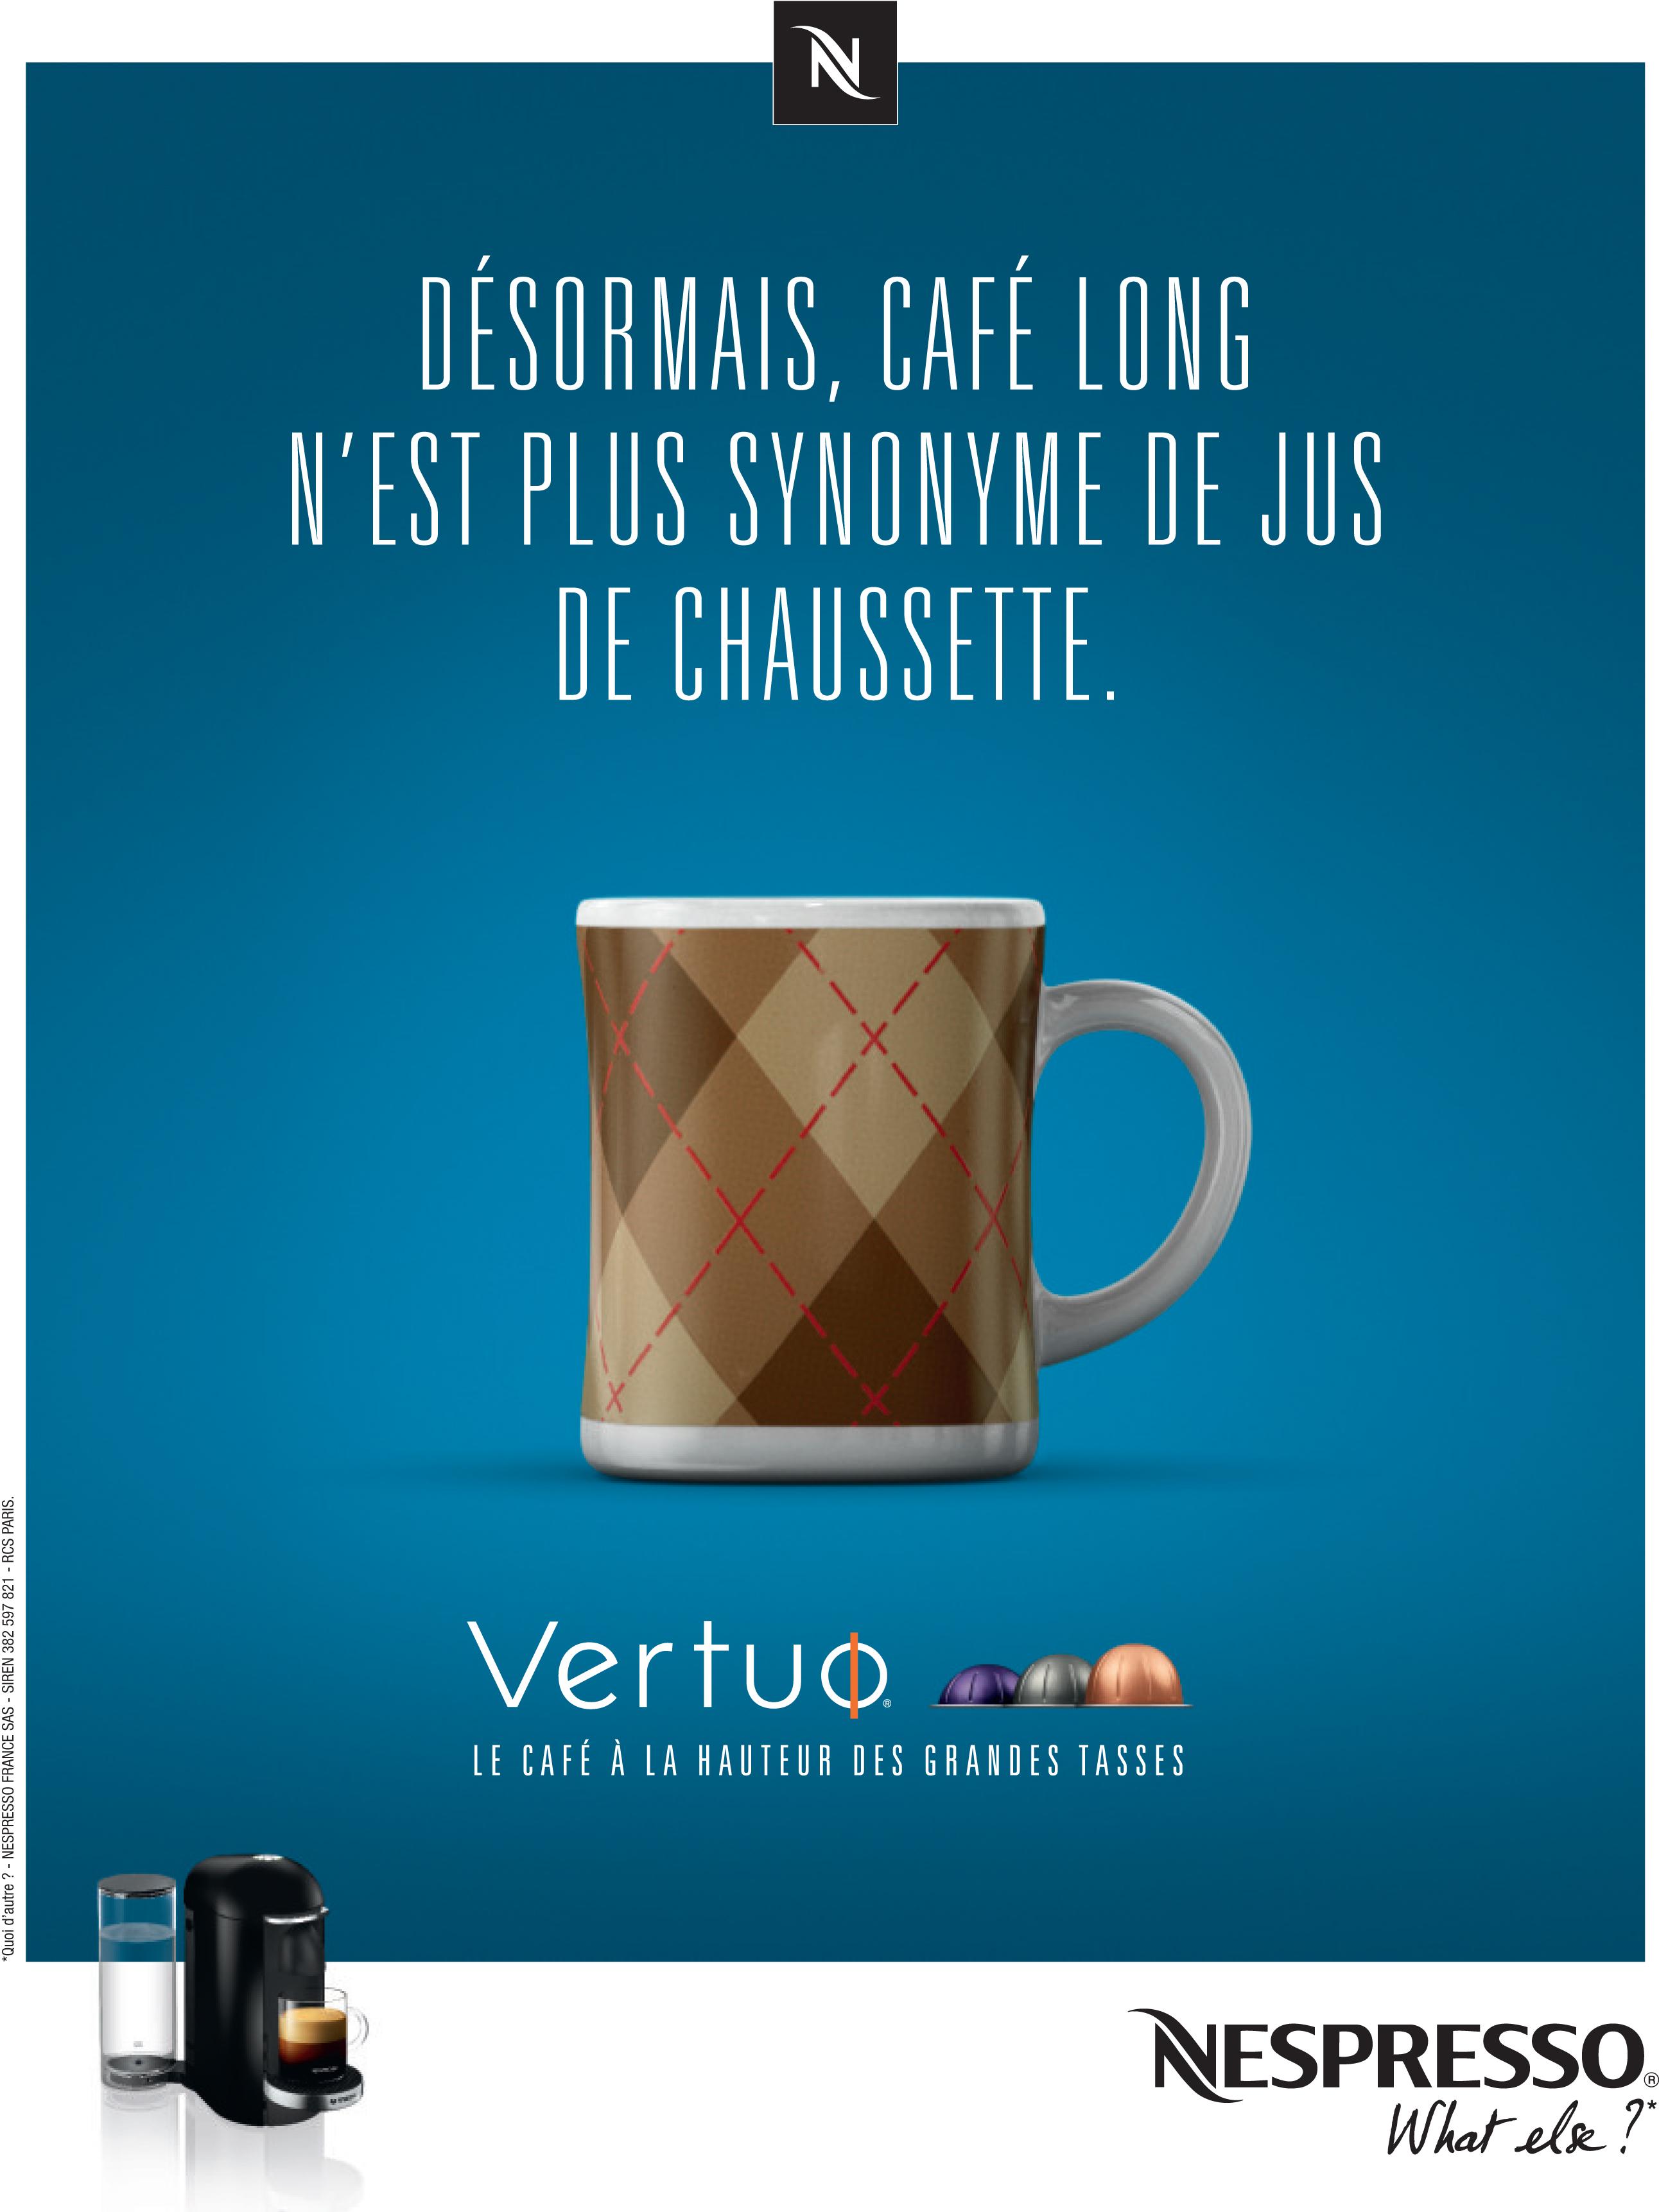 Nespresso Oubliés Food Mugs Geekamp; Rend Aux Love Hommage – eBdCxo